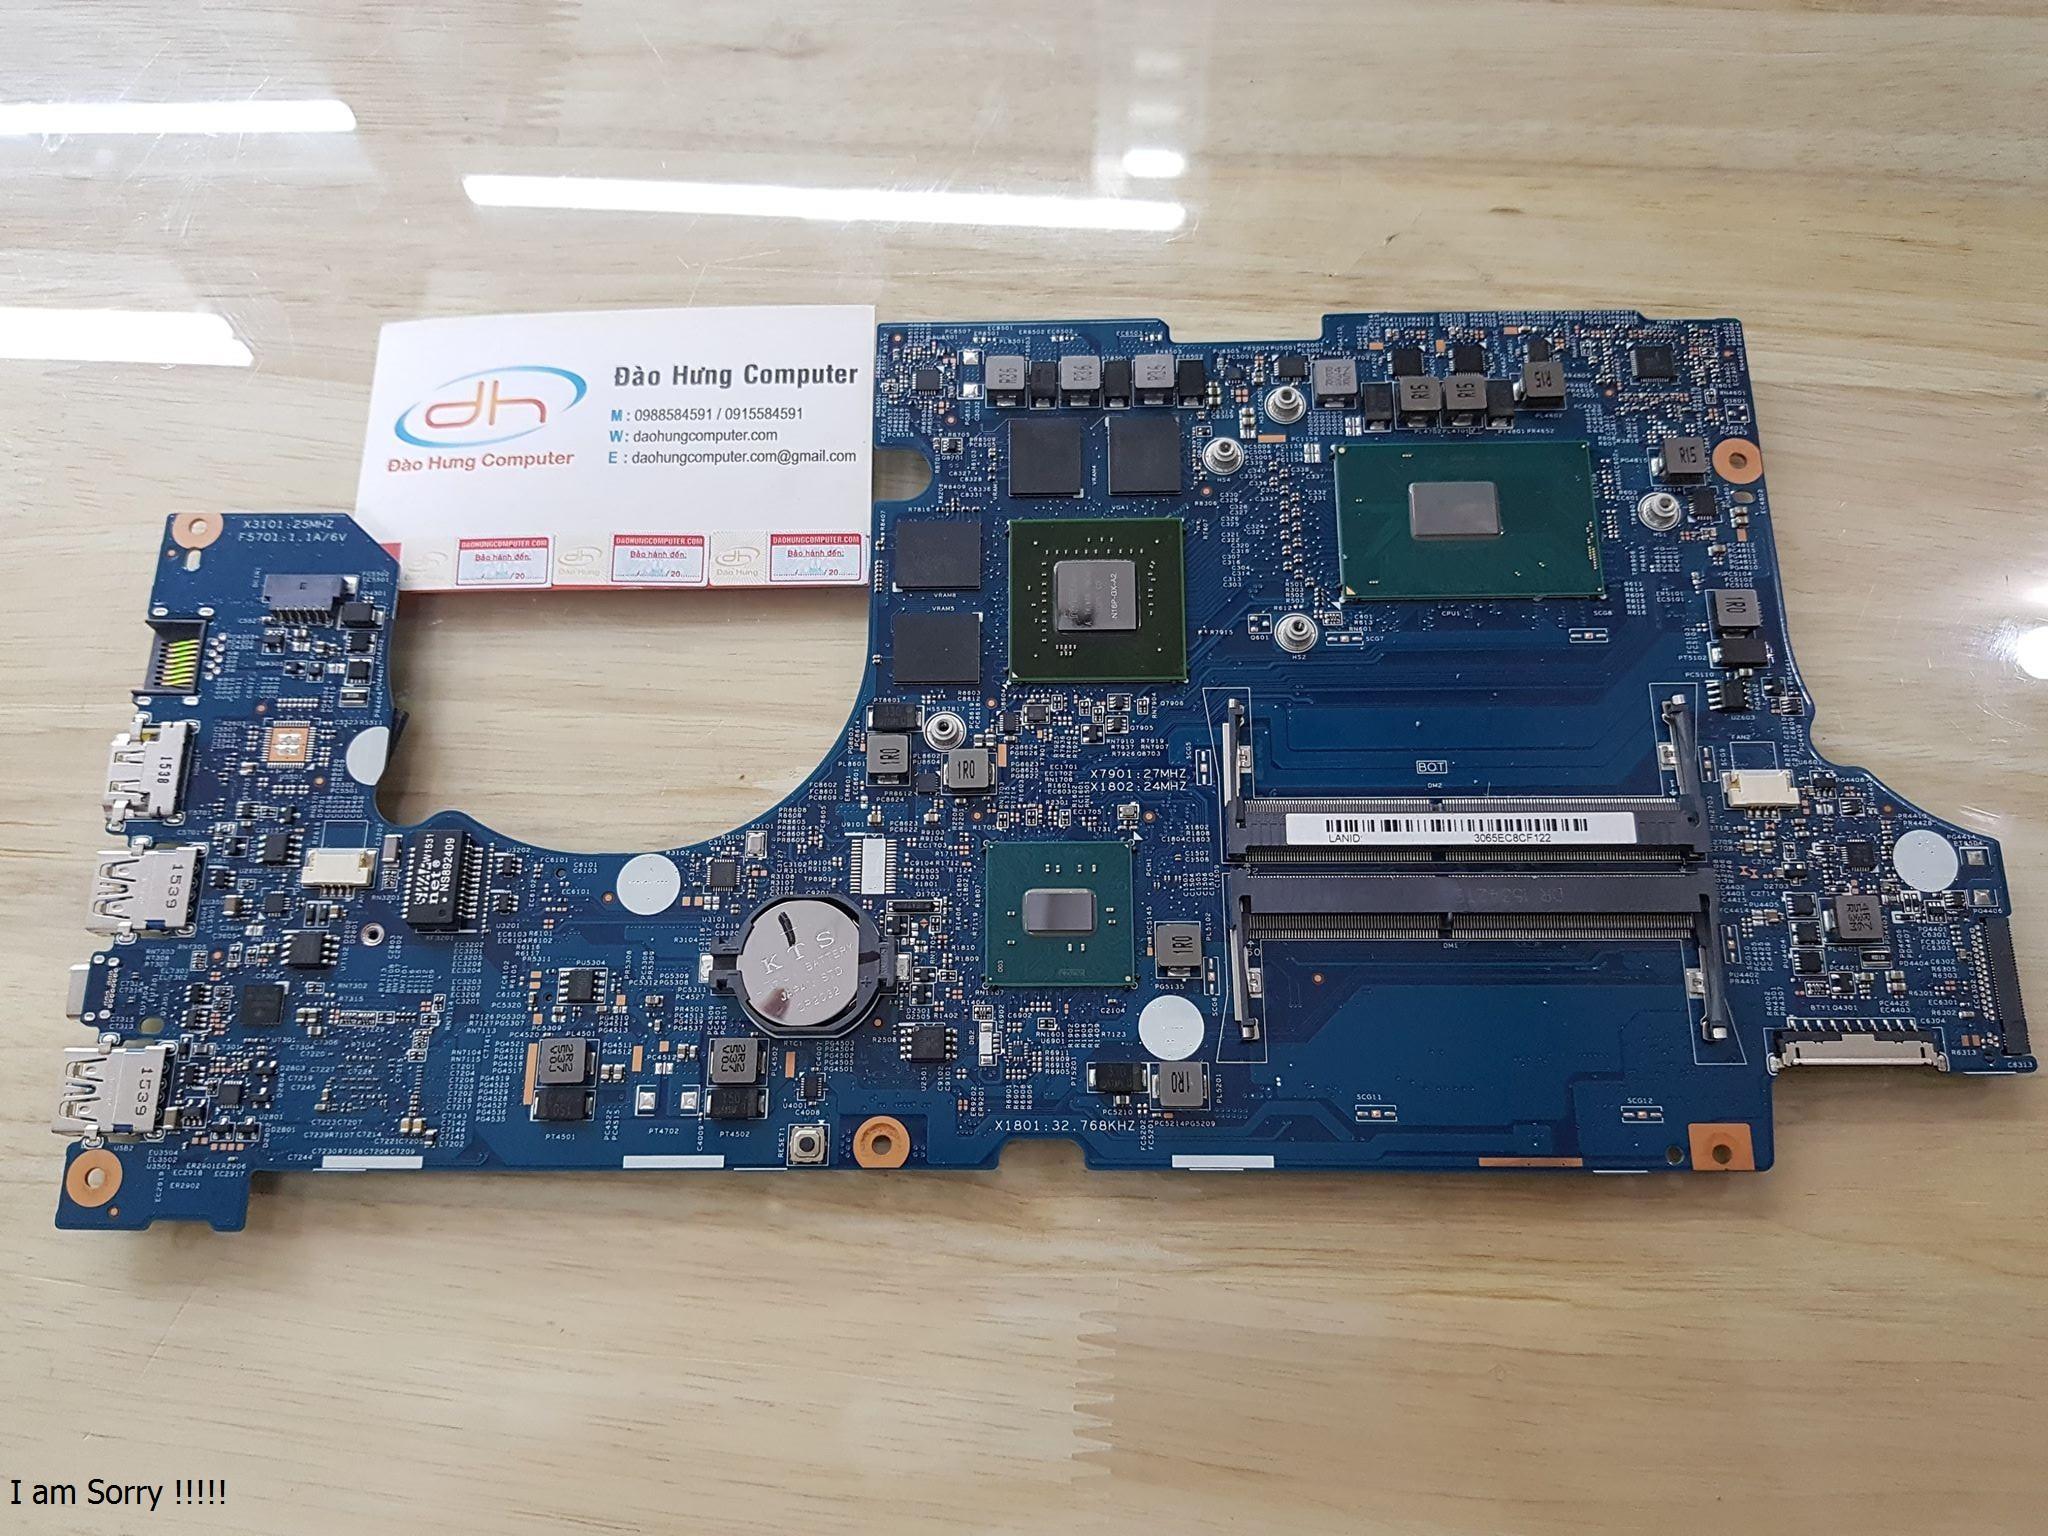 mainboard-acer-nitro-vn7-592g-core-i5-6300hq-gtx-960m-4gb